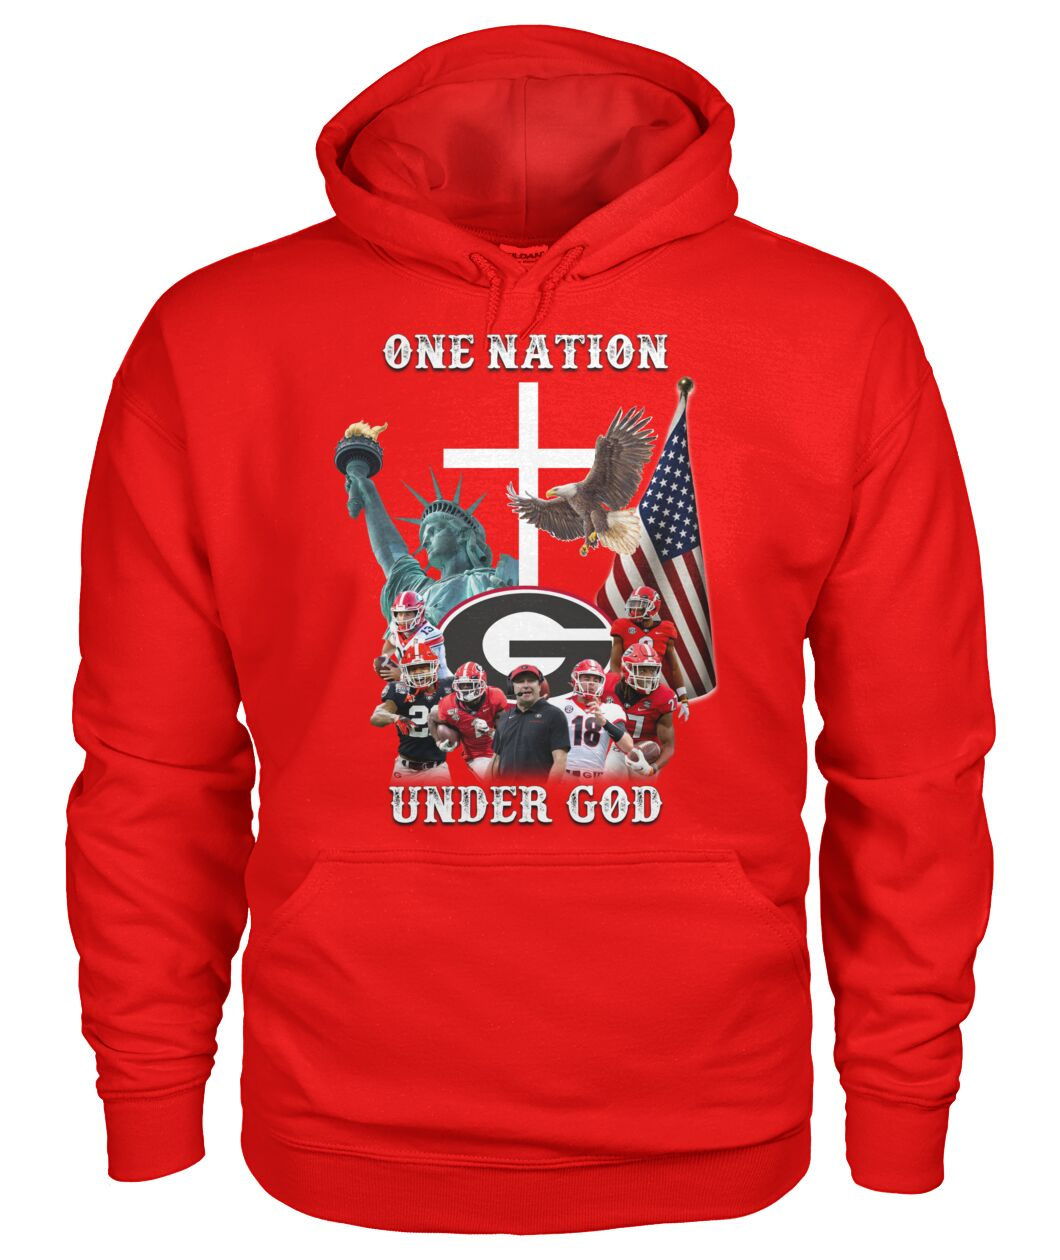 Georgia Bulldogs football One nation under god shirt 14